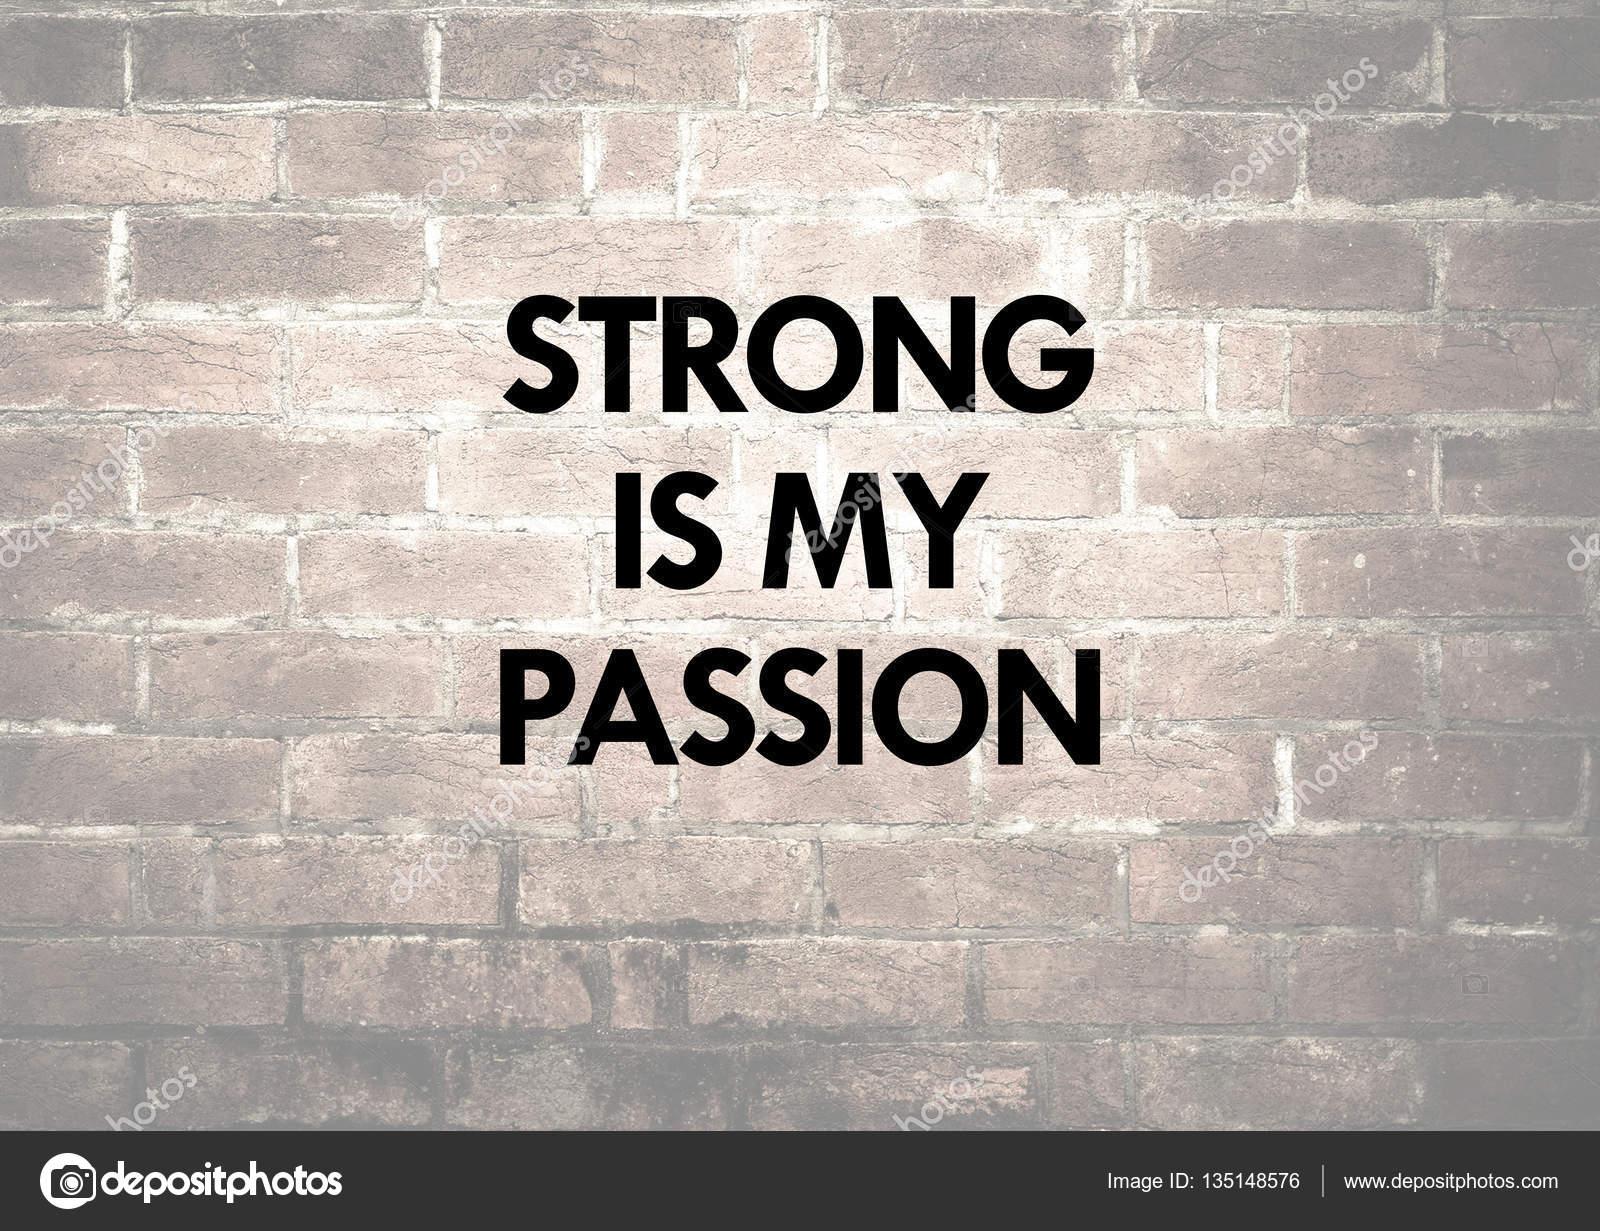 Fitness Motivation Quotes Fot Better Workout Stock Photo C Jakysinka 135148576